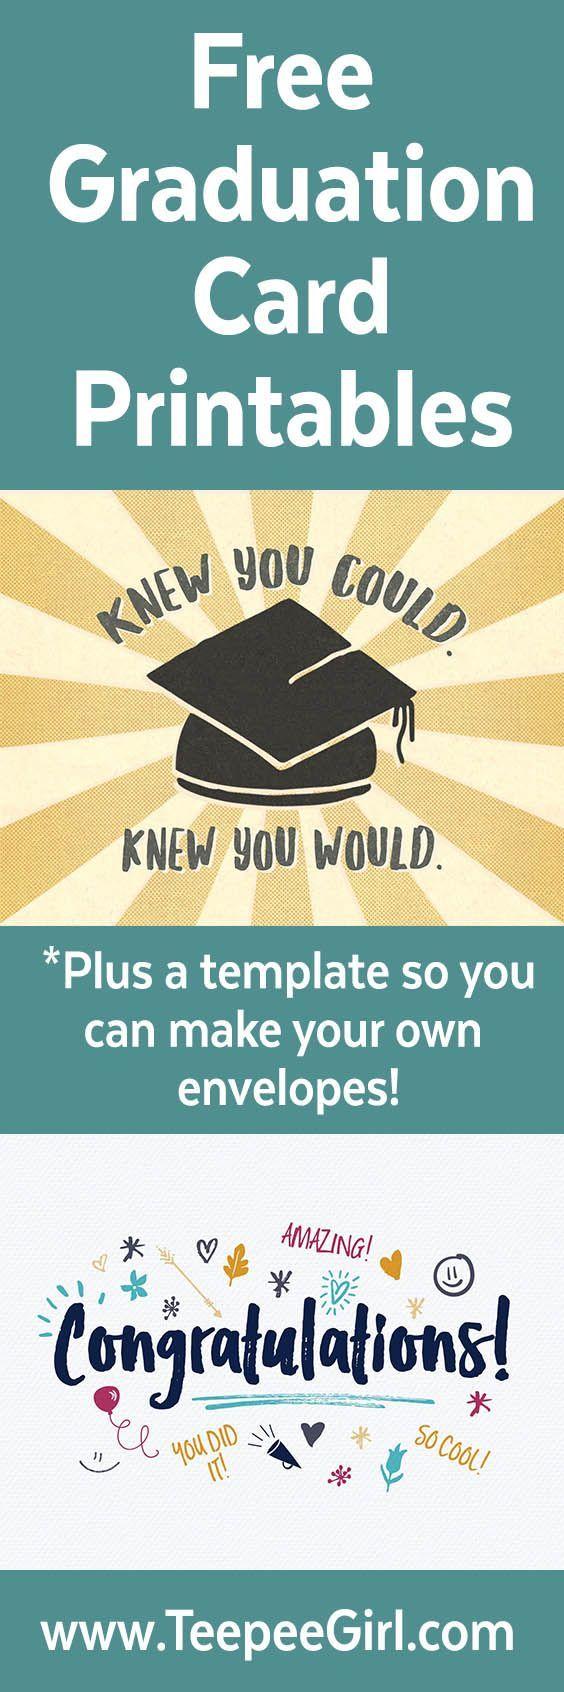 free graduation cards plus envelope template  graduation